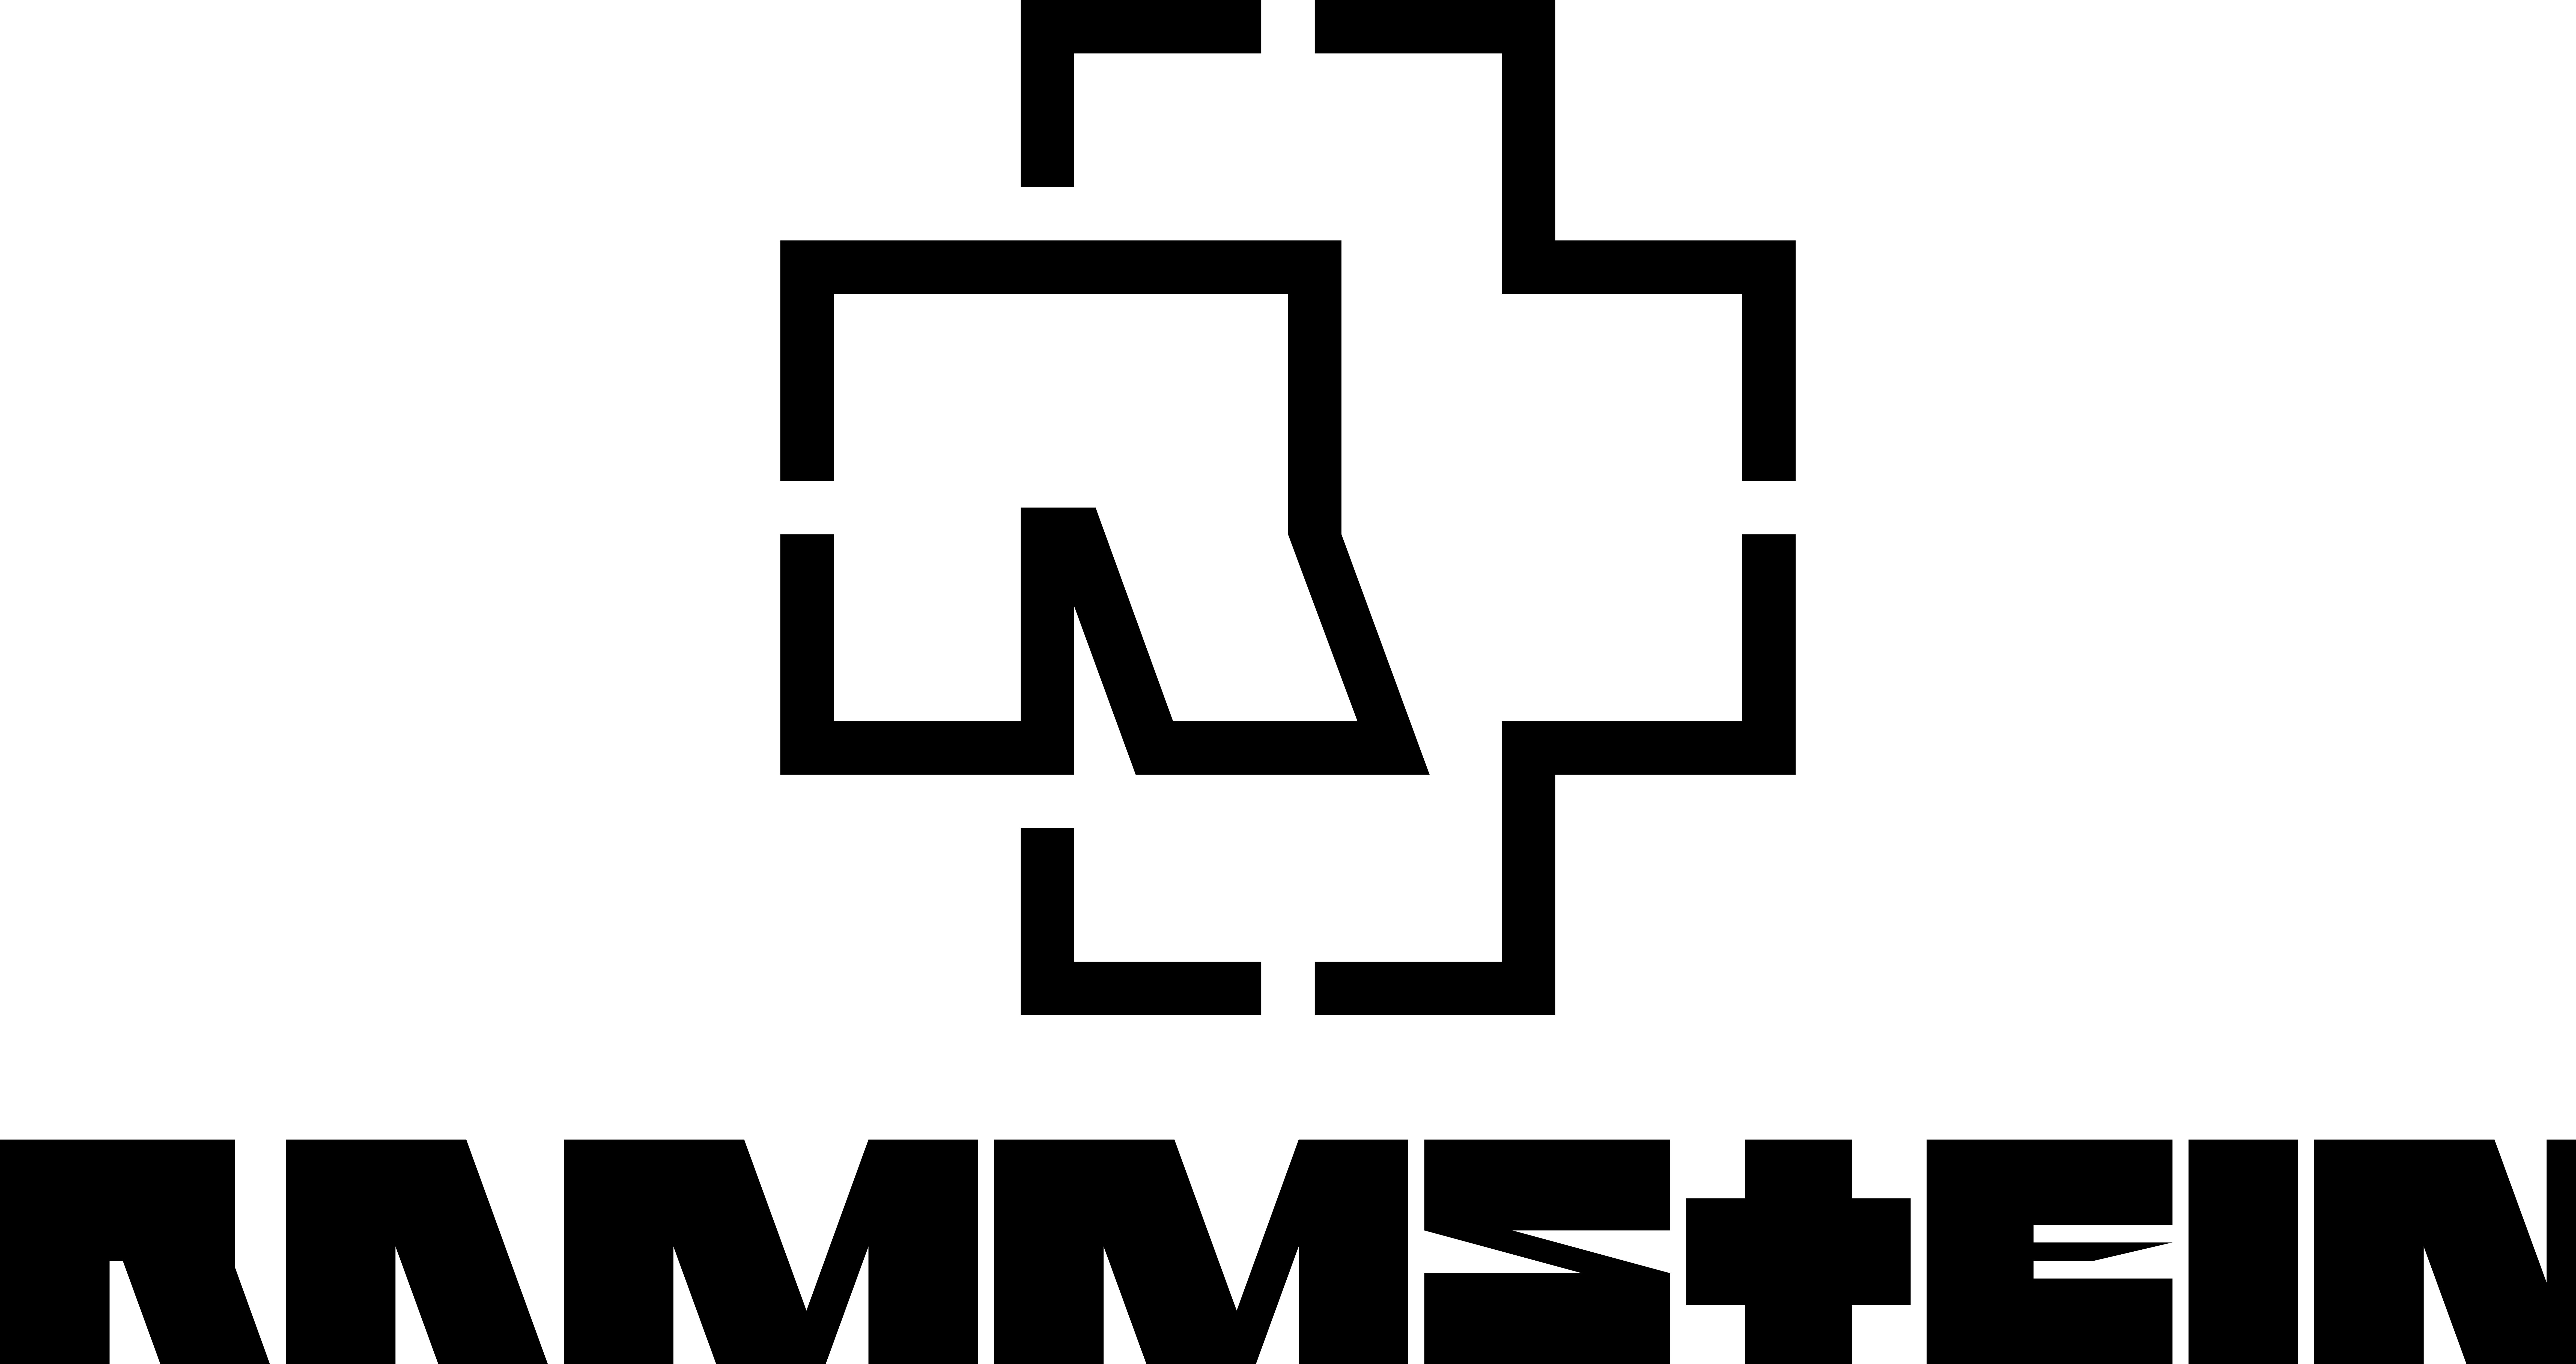 Wonderful Wallpaper Logo Rammstein - Rammstein-Wallpapers-HD  Pictures_99335.png